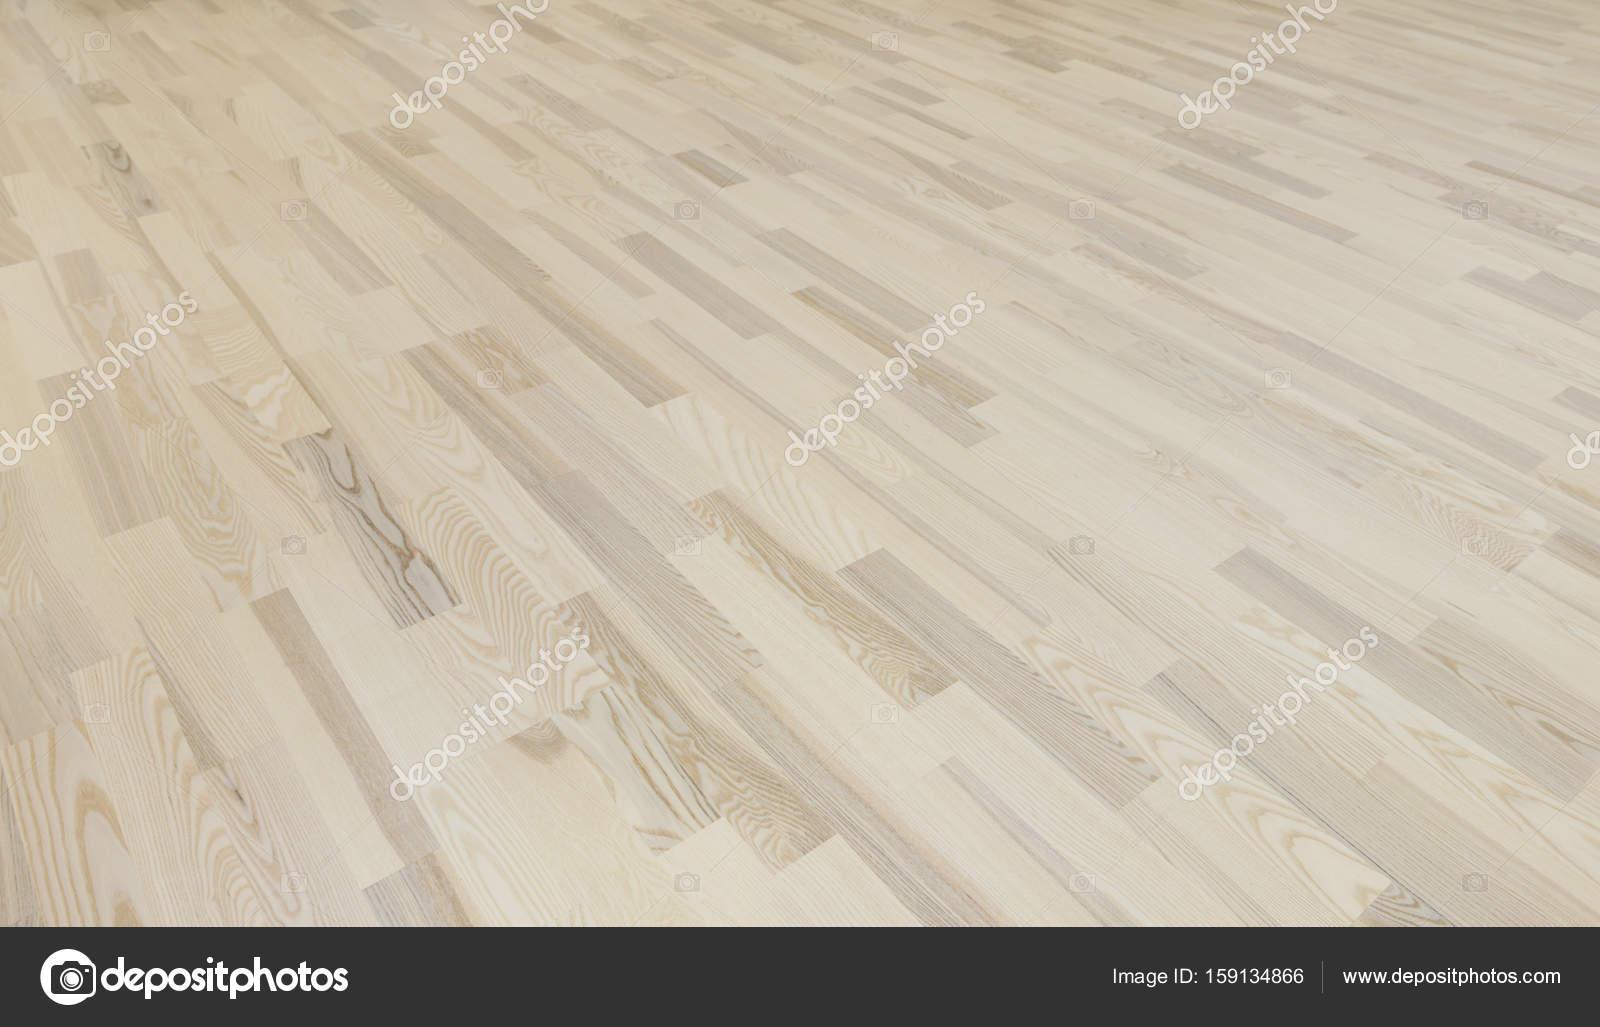 Parquet Floor White Oak Texture As Background Stock Photo